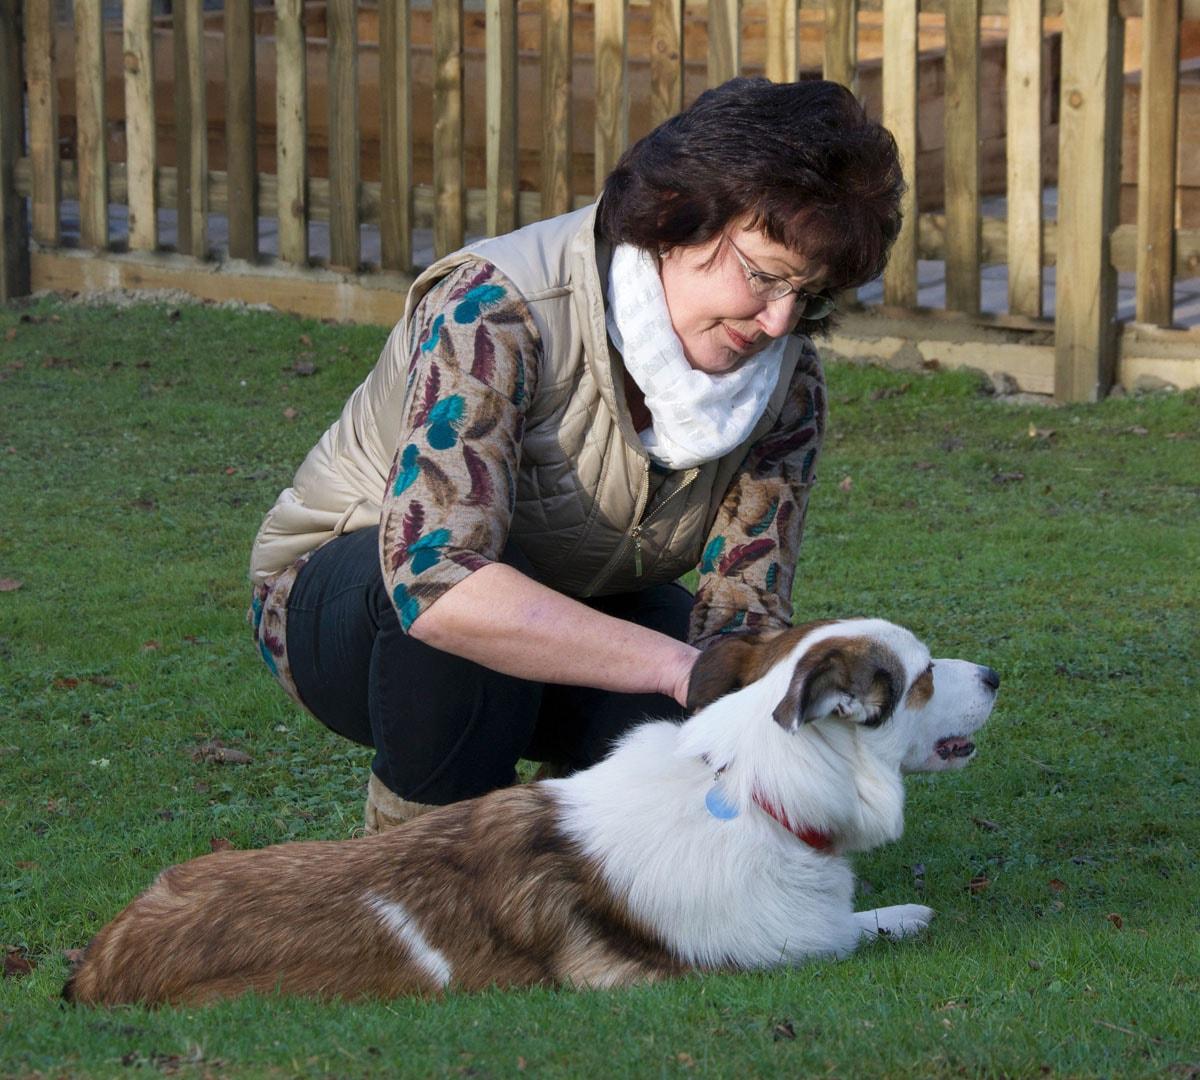 Sarah Wilson of Happy Tails Dog Training